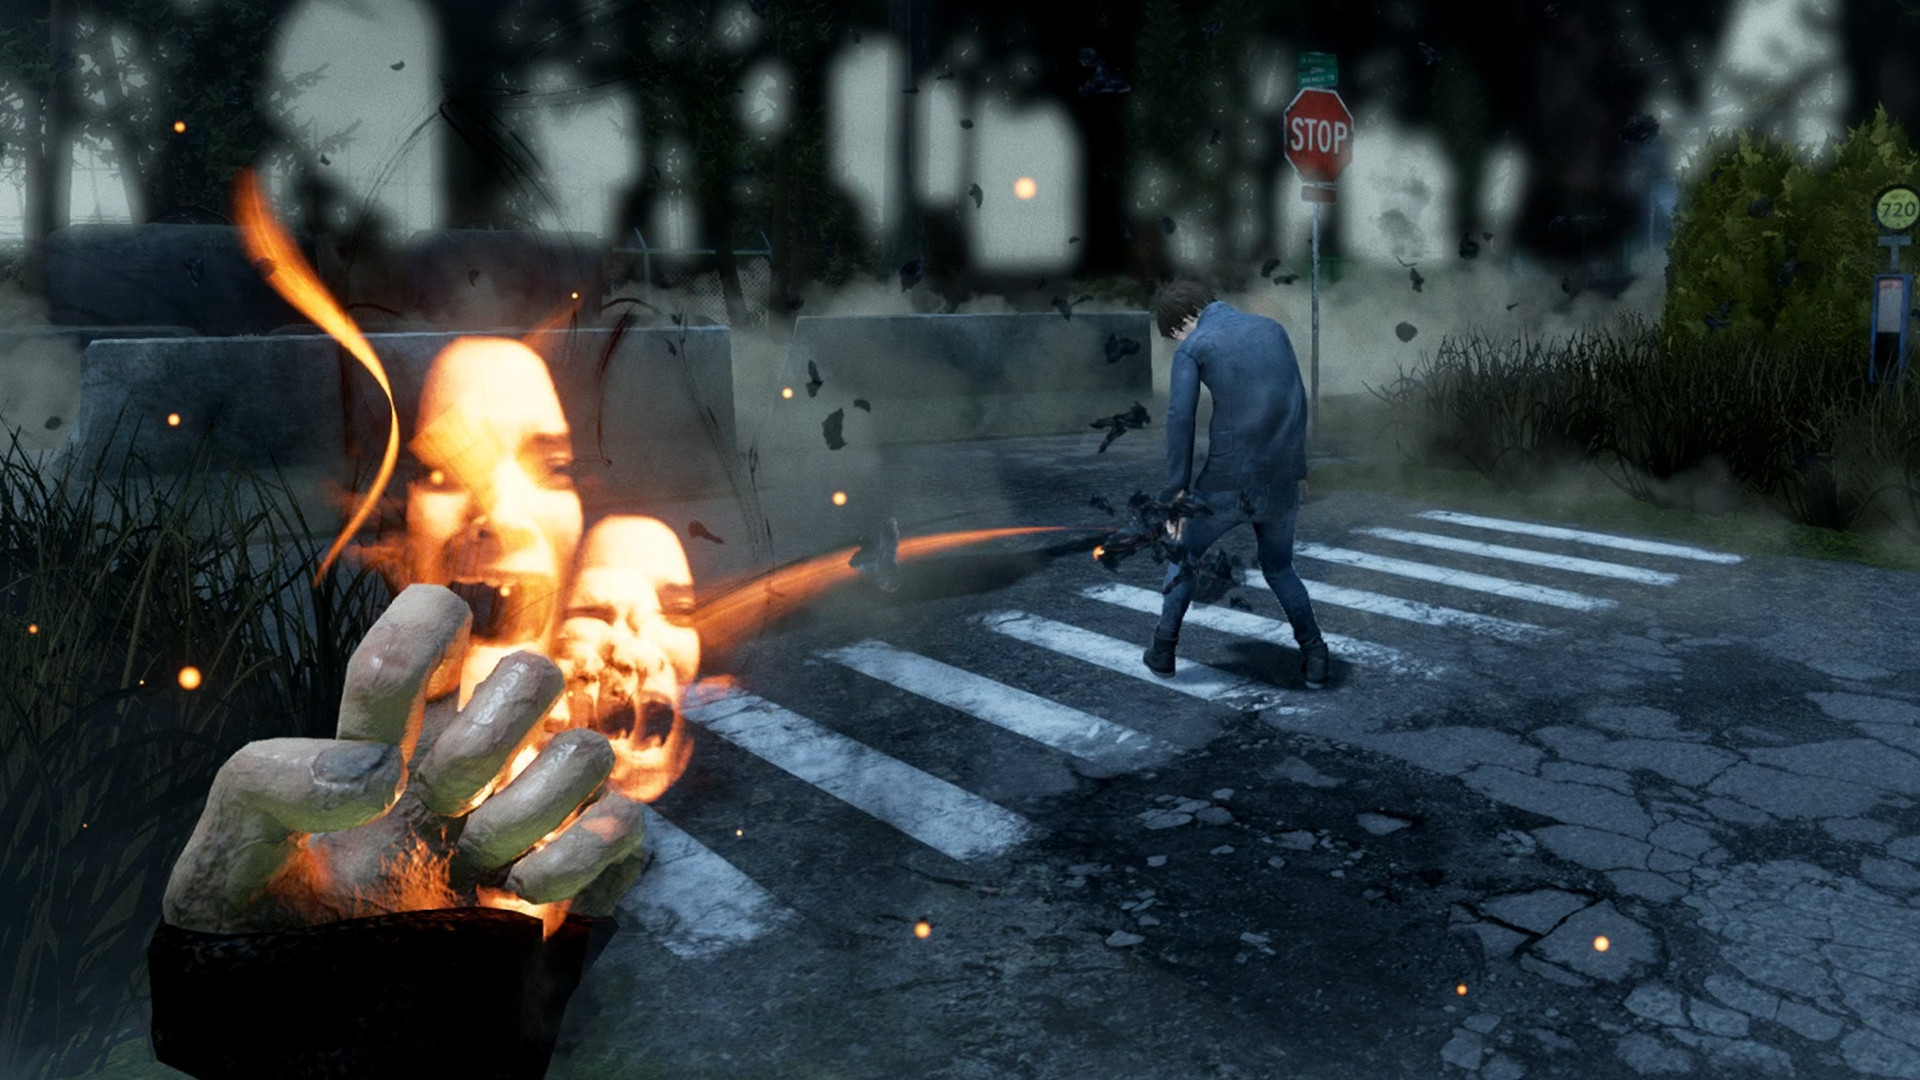 KHAiHOM.com - Dead by Daylight - A Nightmare on Elm Street™